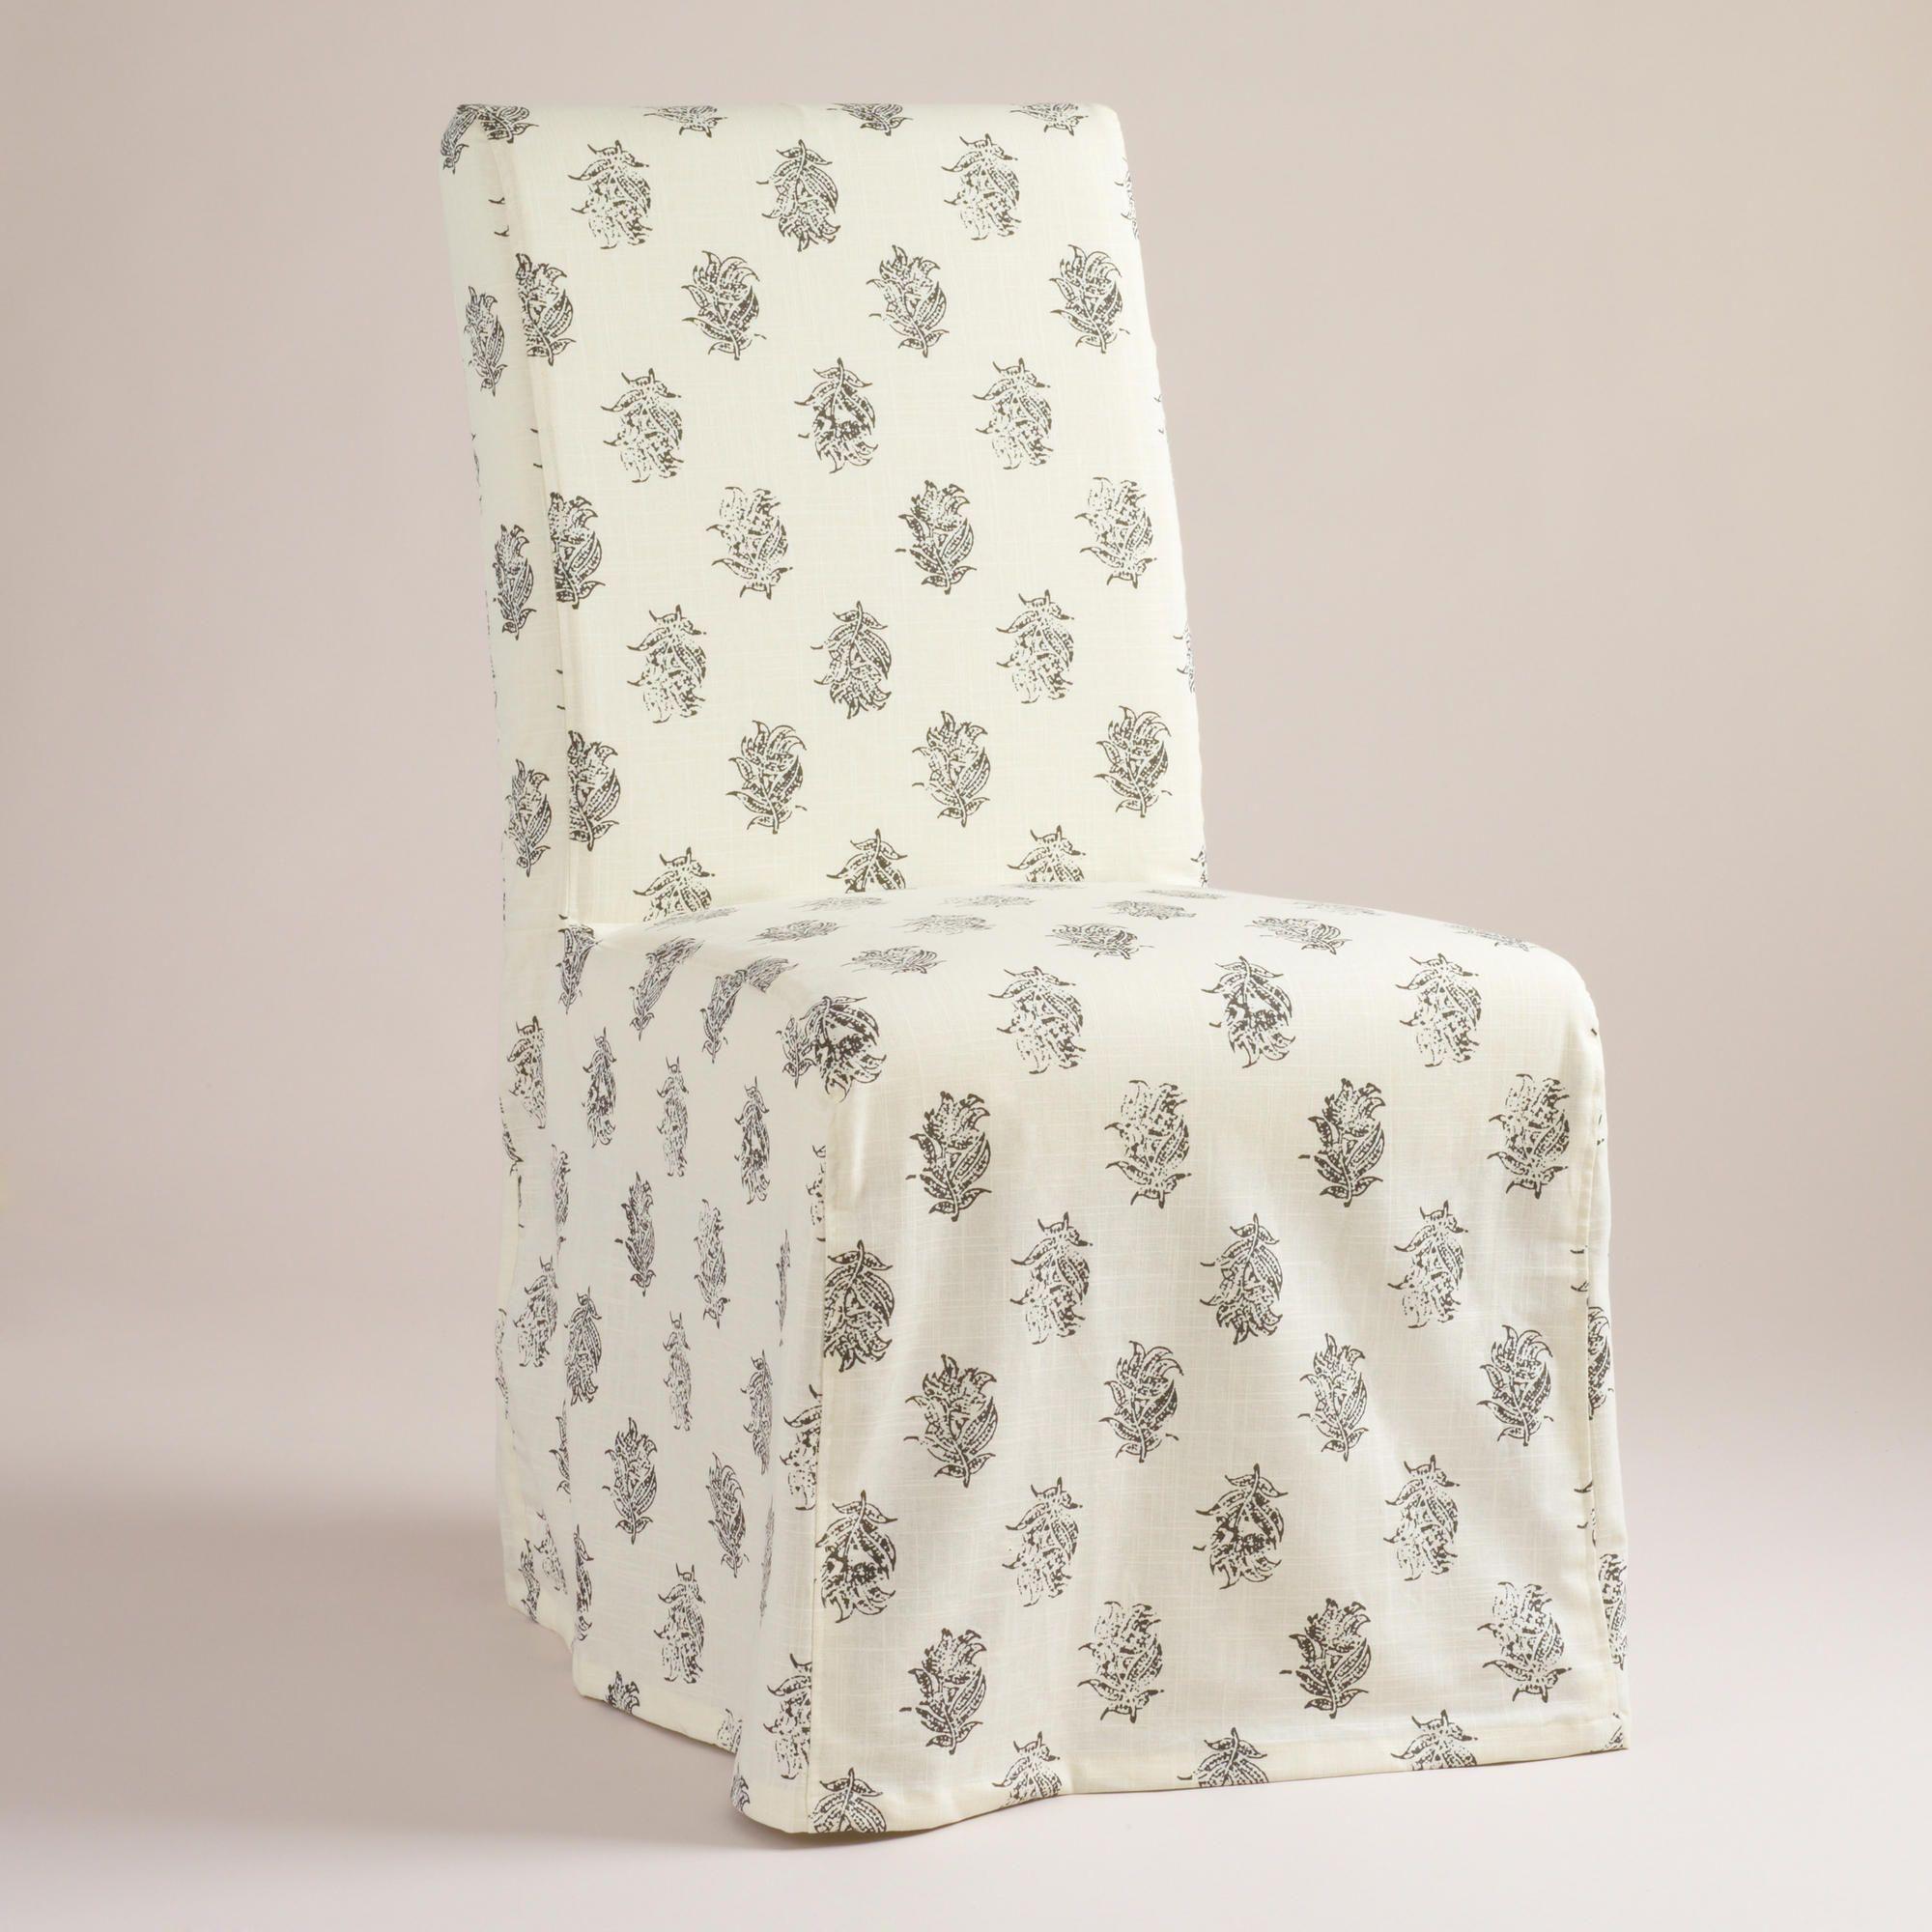 Block Print Long Anna Chair Slipcover Slipcovers for